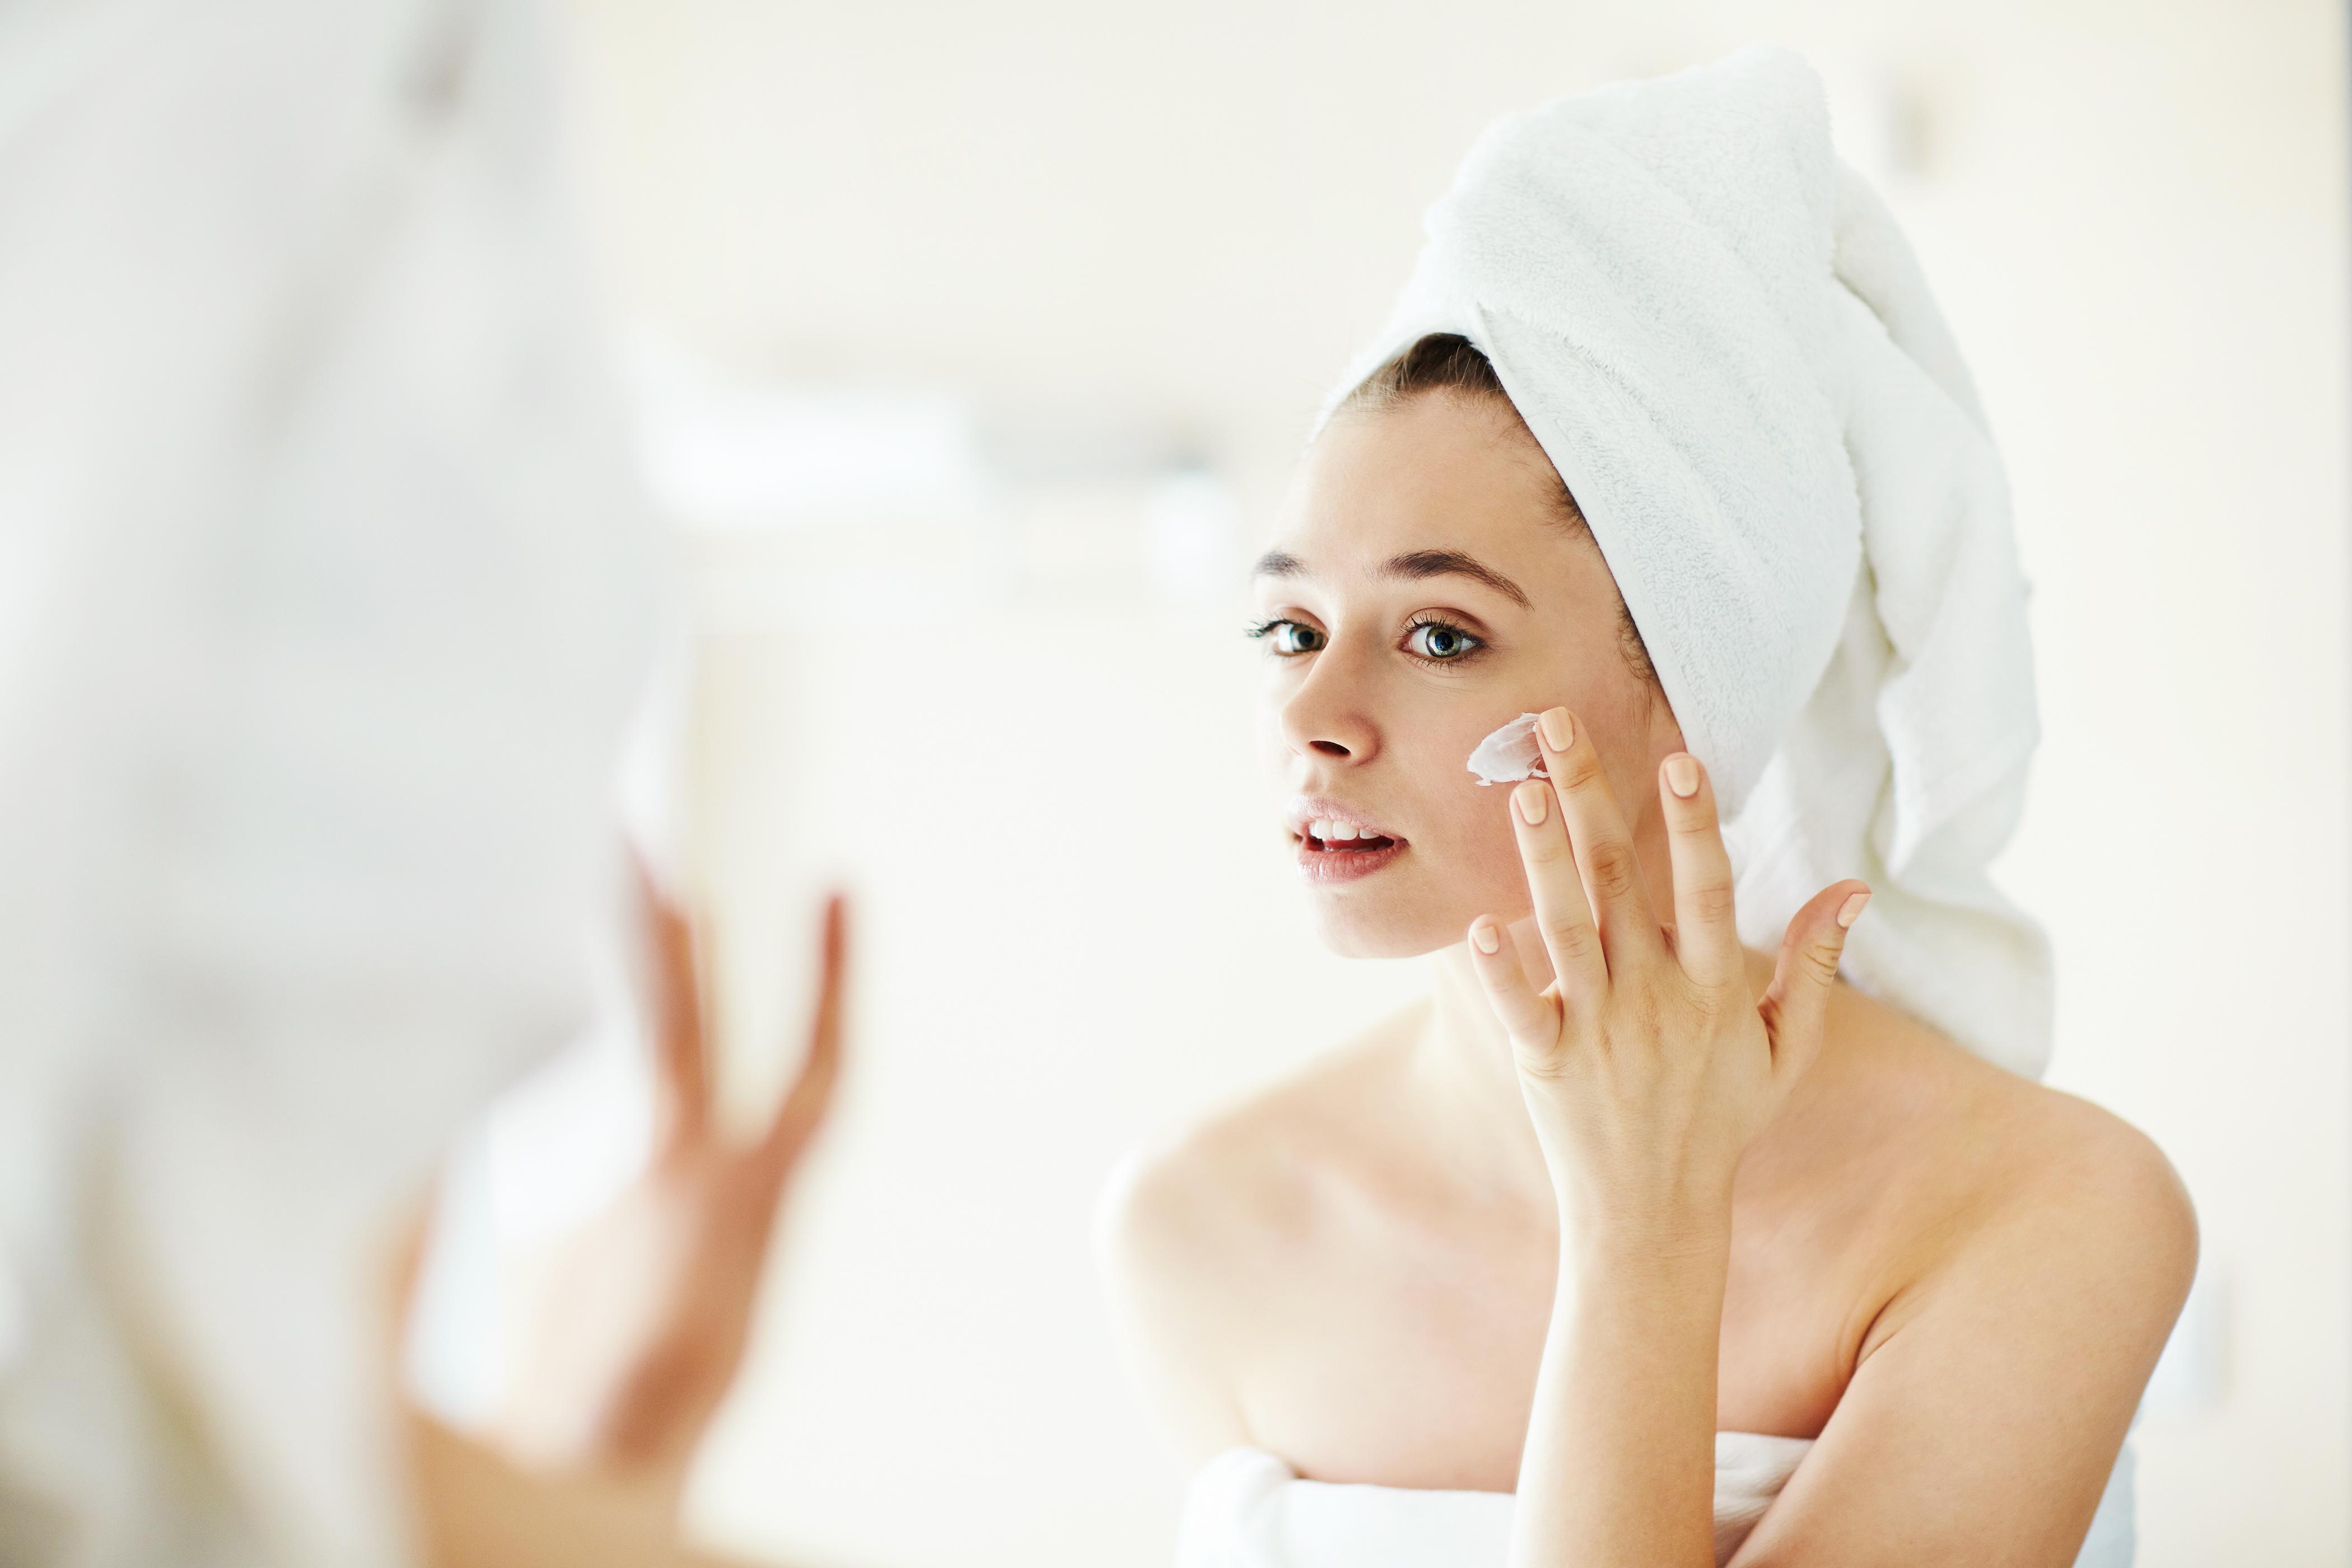 6 conseils contre la peau grasse